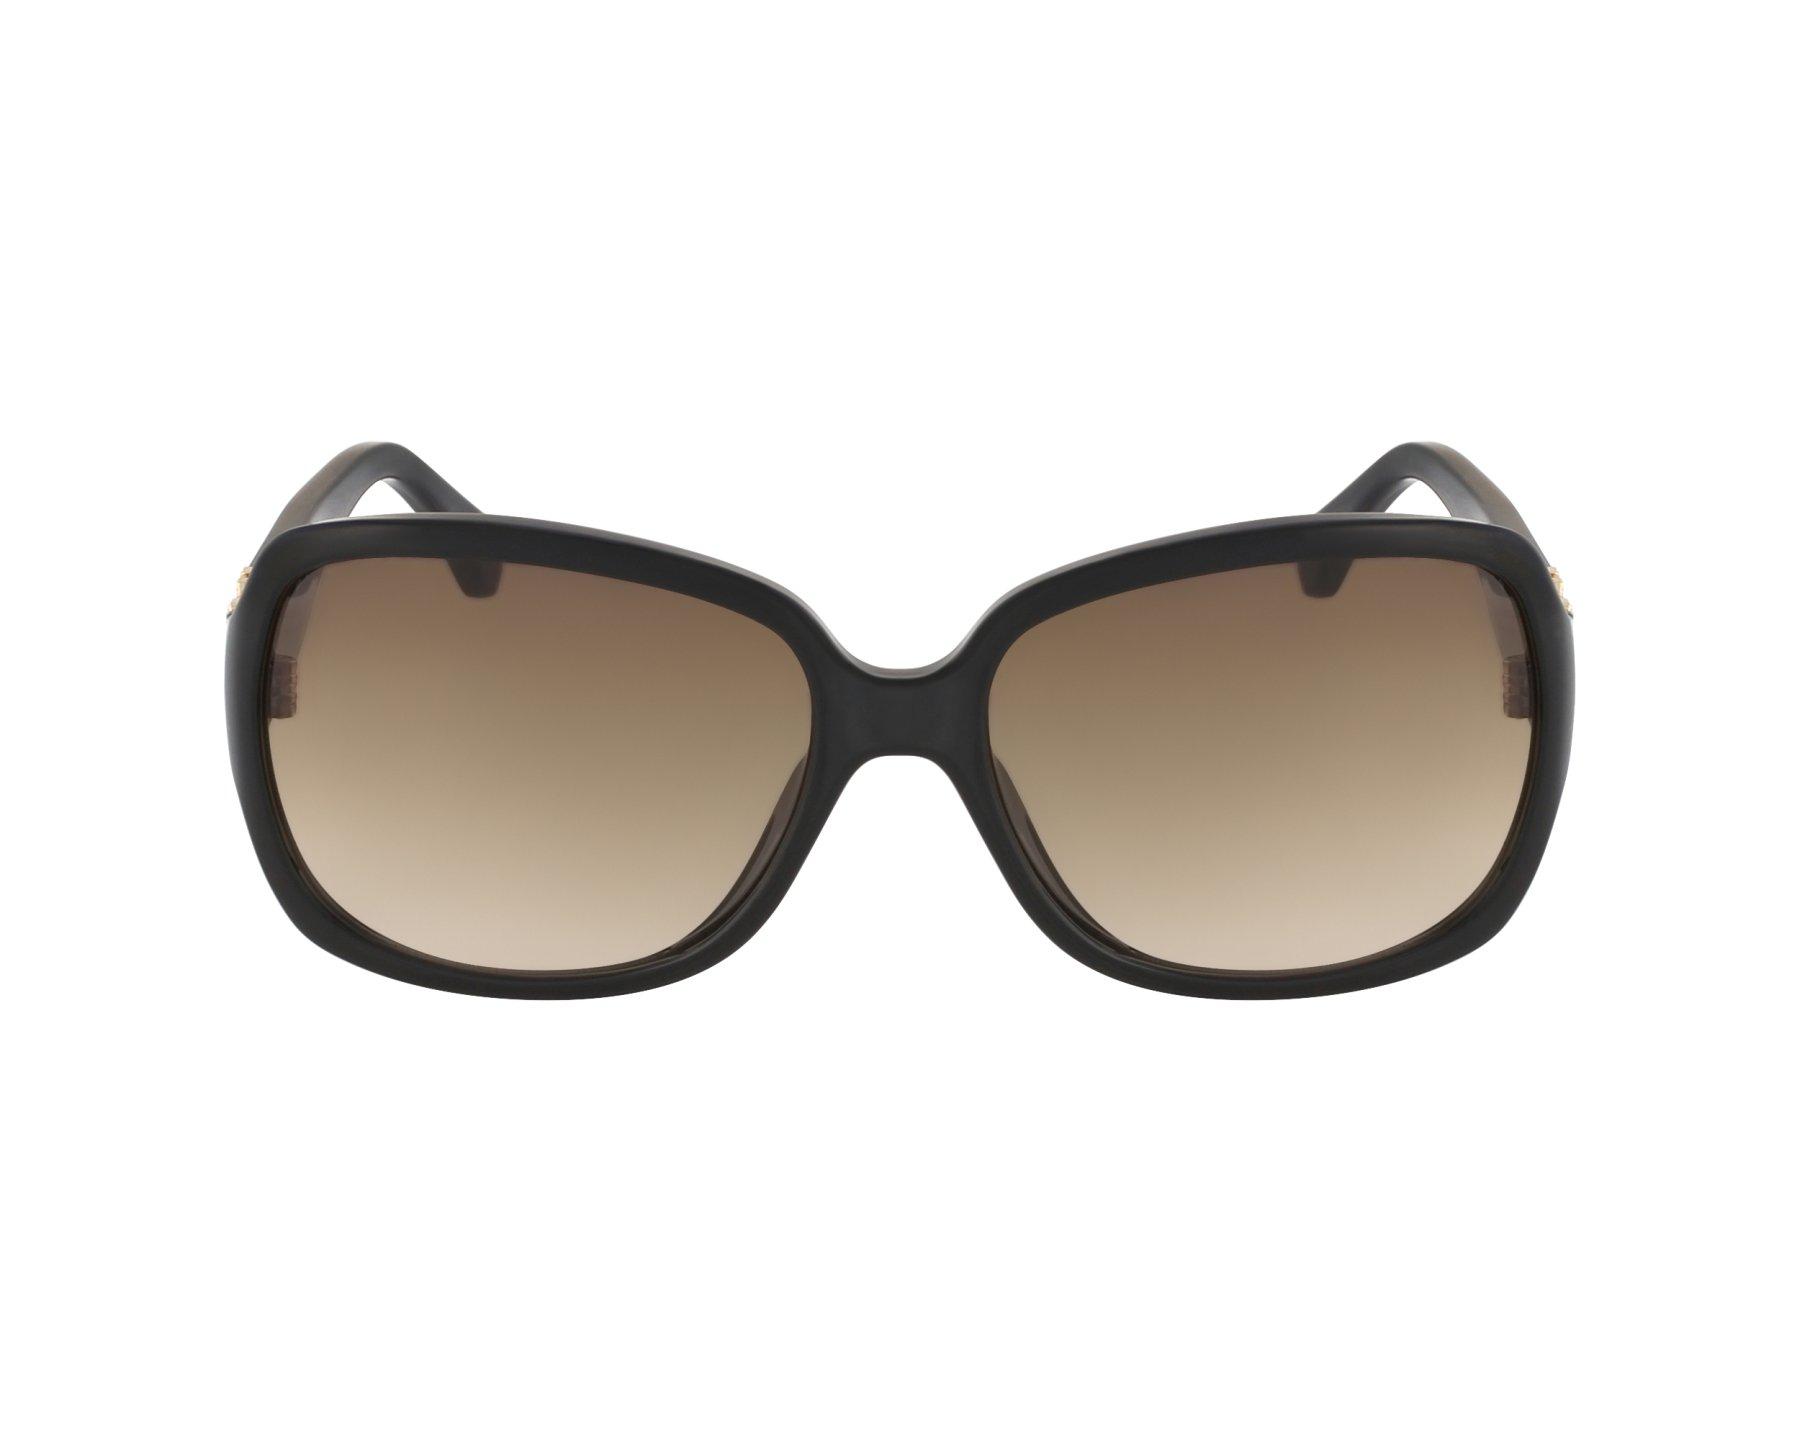 24cddf5c0d60 Sunglasses Michael Kors M-2890-S 001 - Black profile view